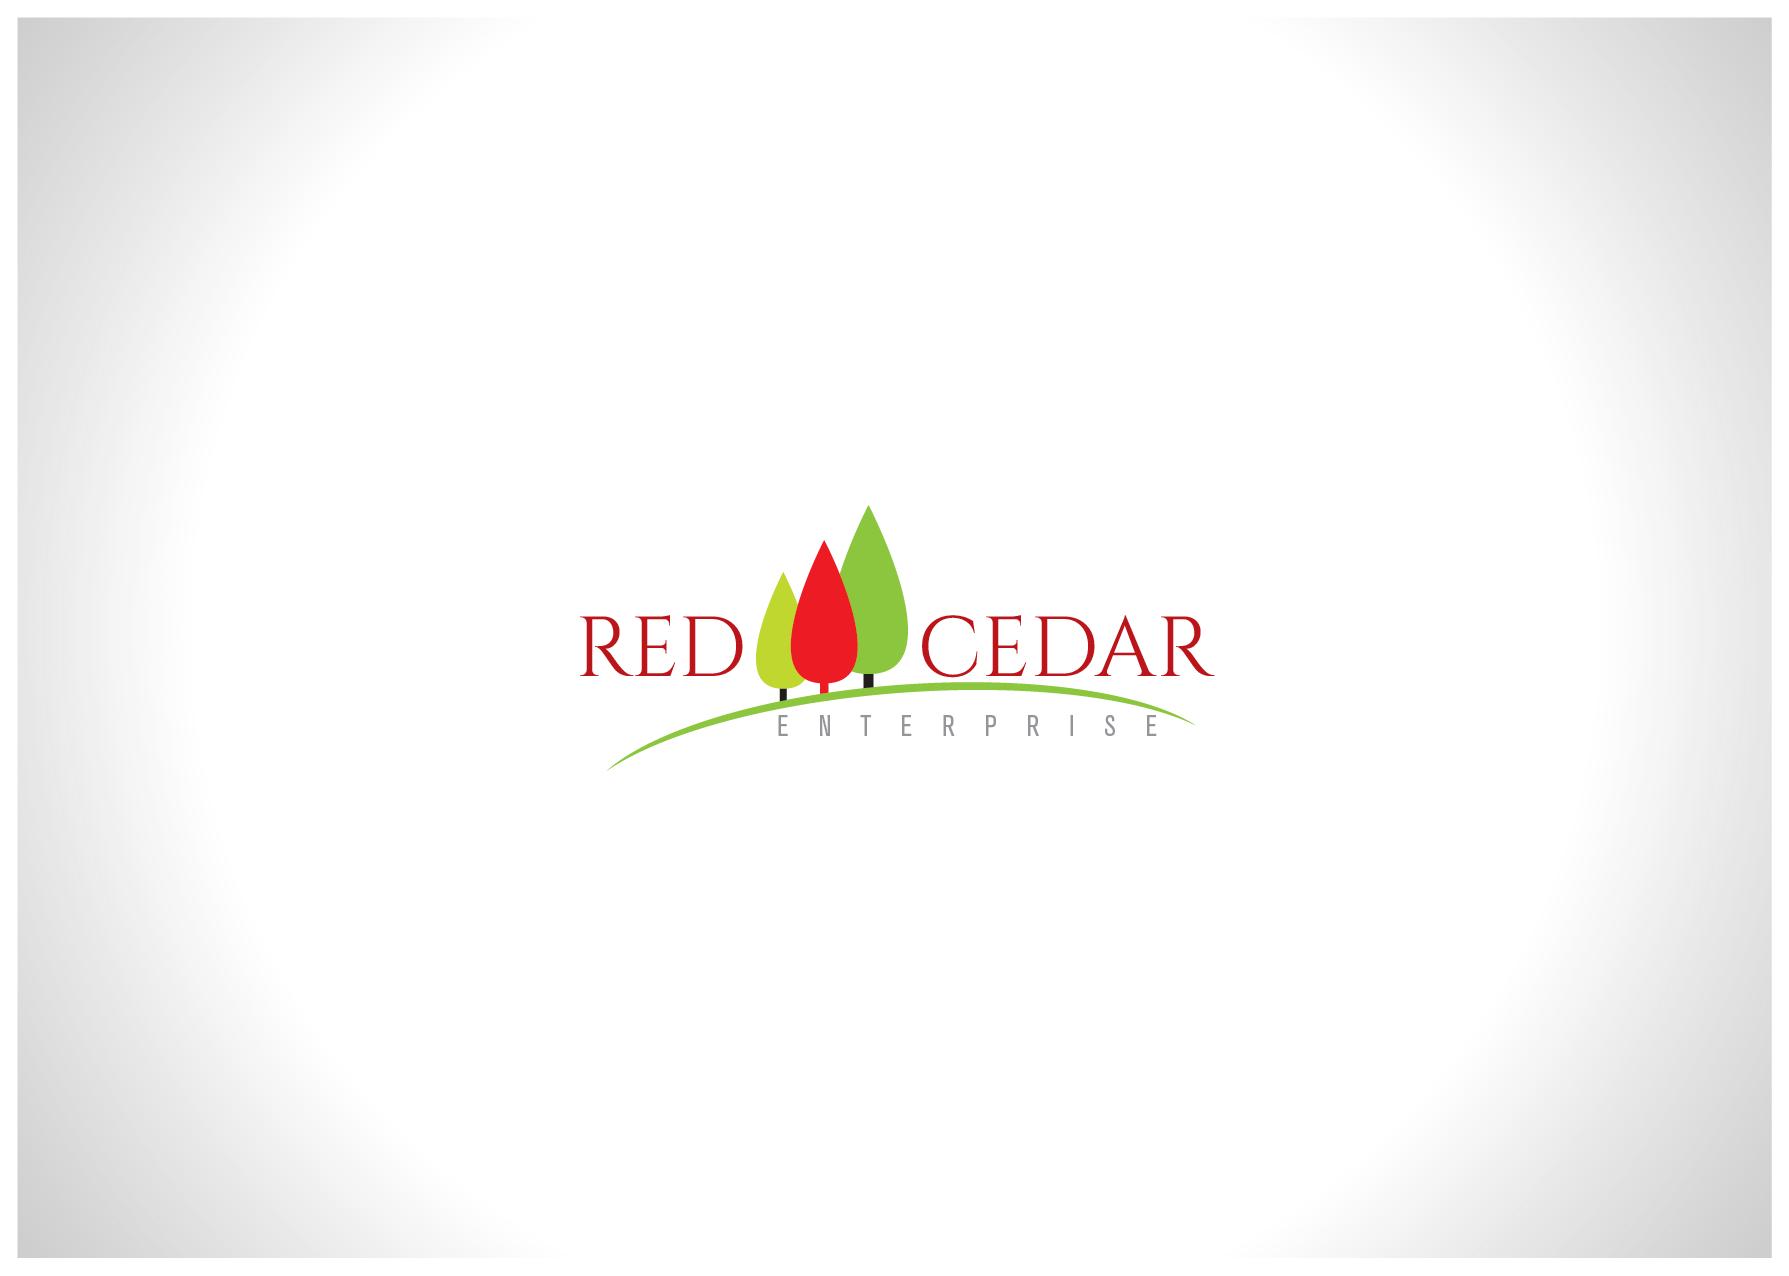 Logo Design by Farrukh Khan - Entry No. 126 in the Logo Design Contest Unique Logo Design Wanted for Red Cedar Enterprise.